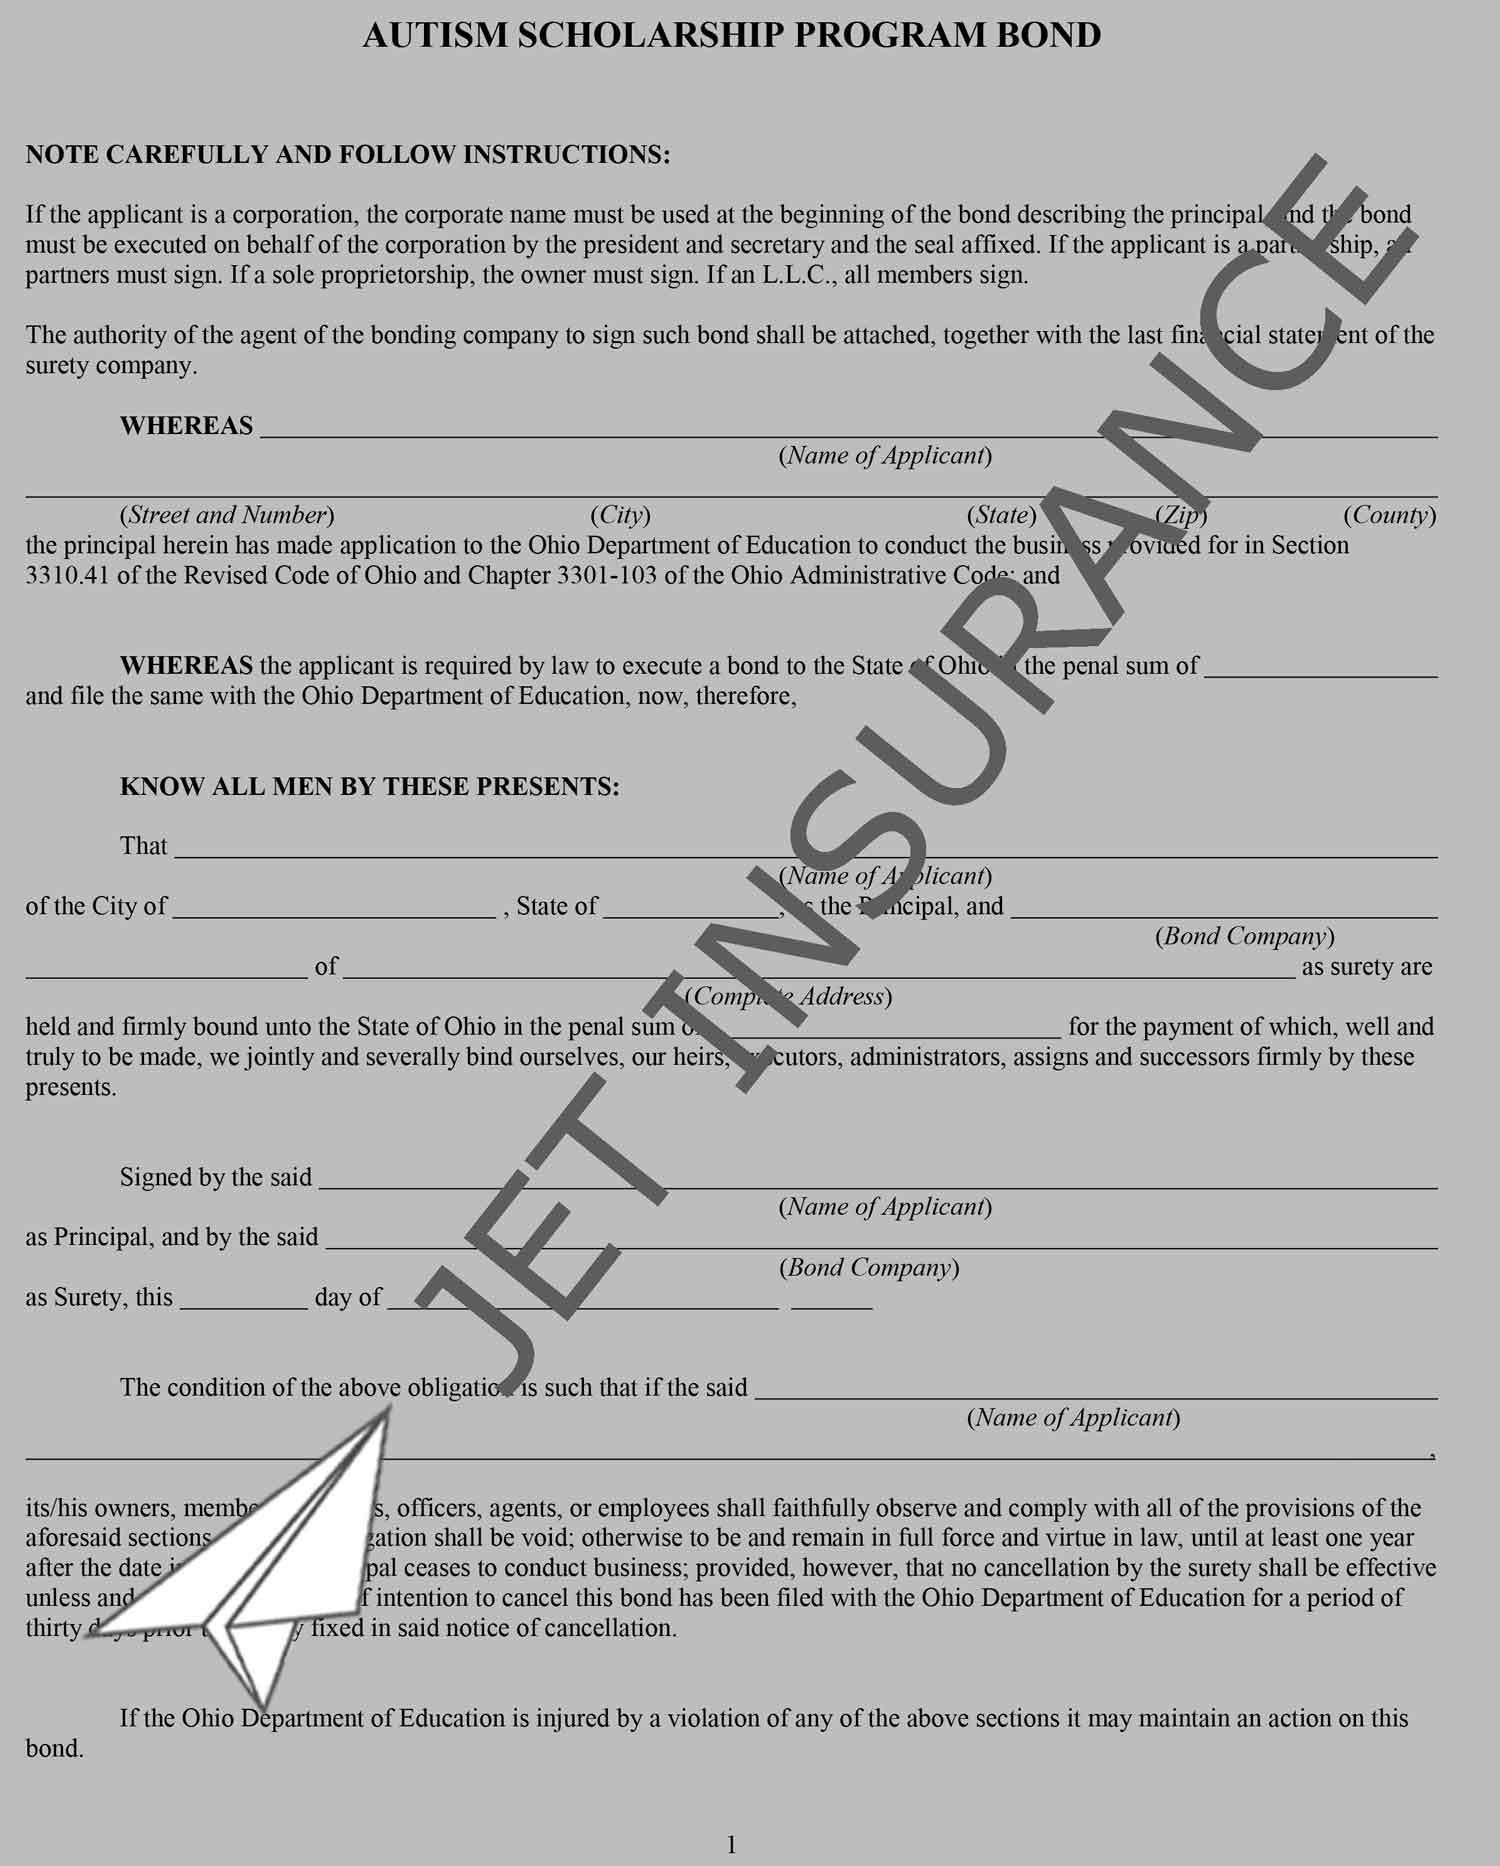 Ohio Autism Scholarship Program Bond Form